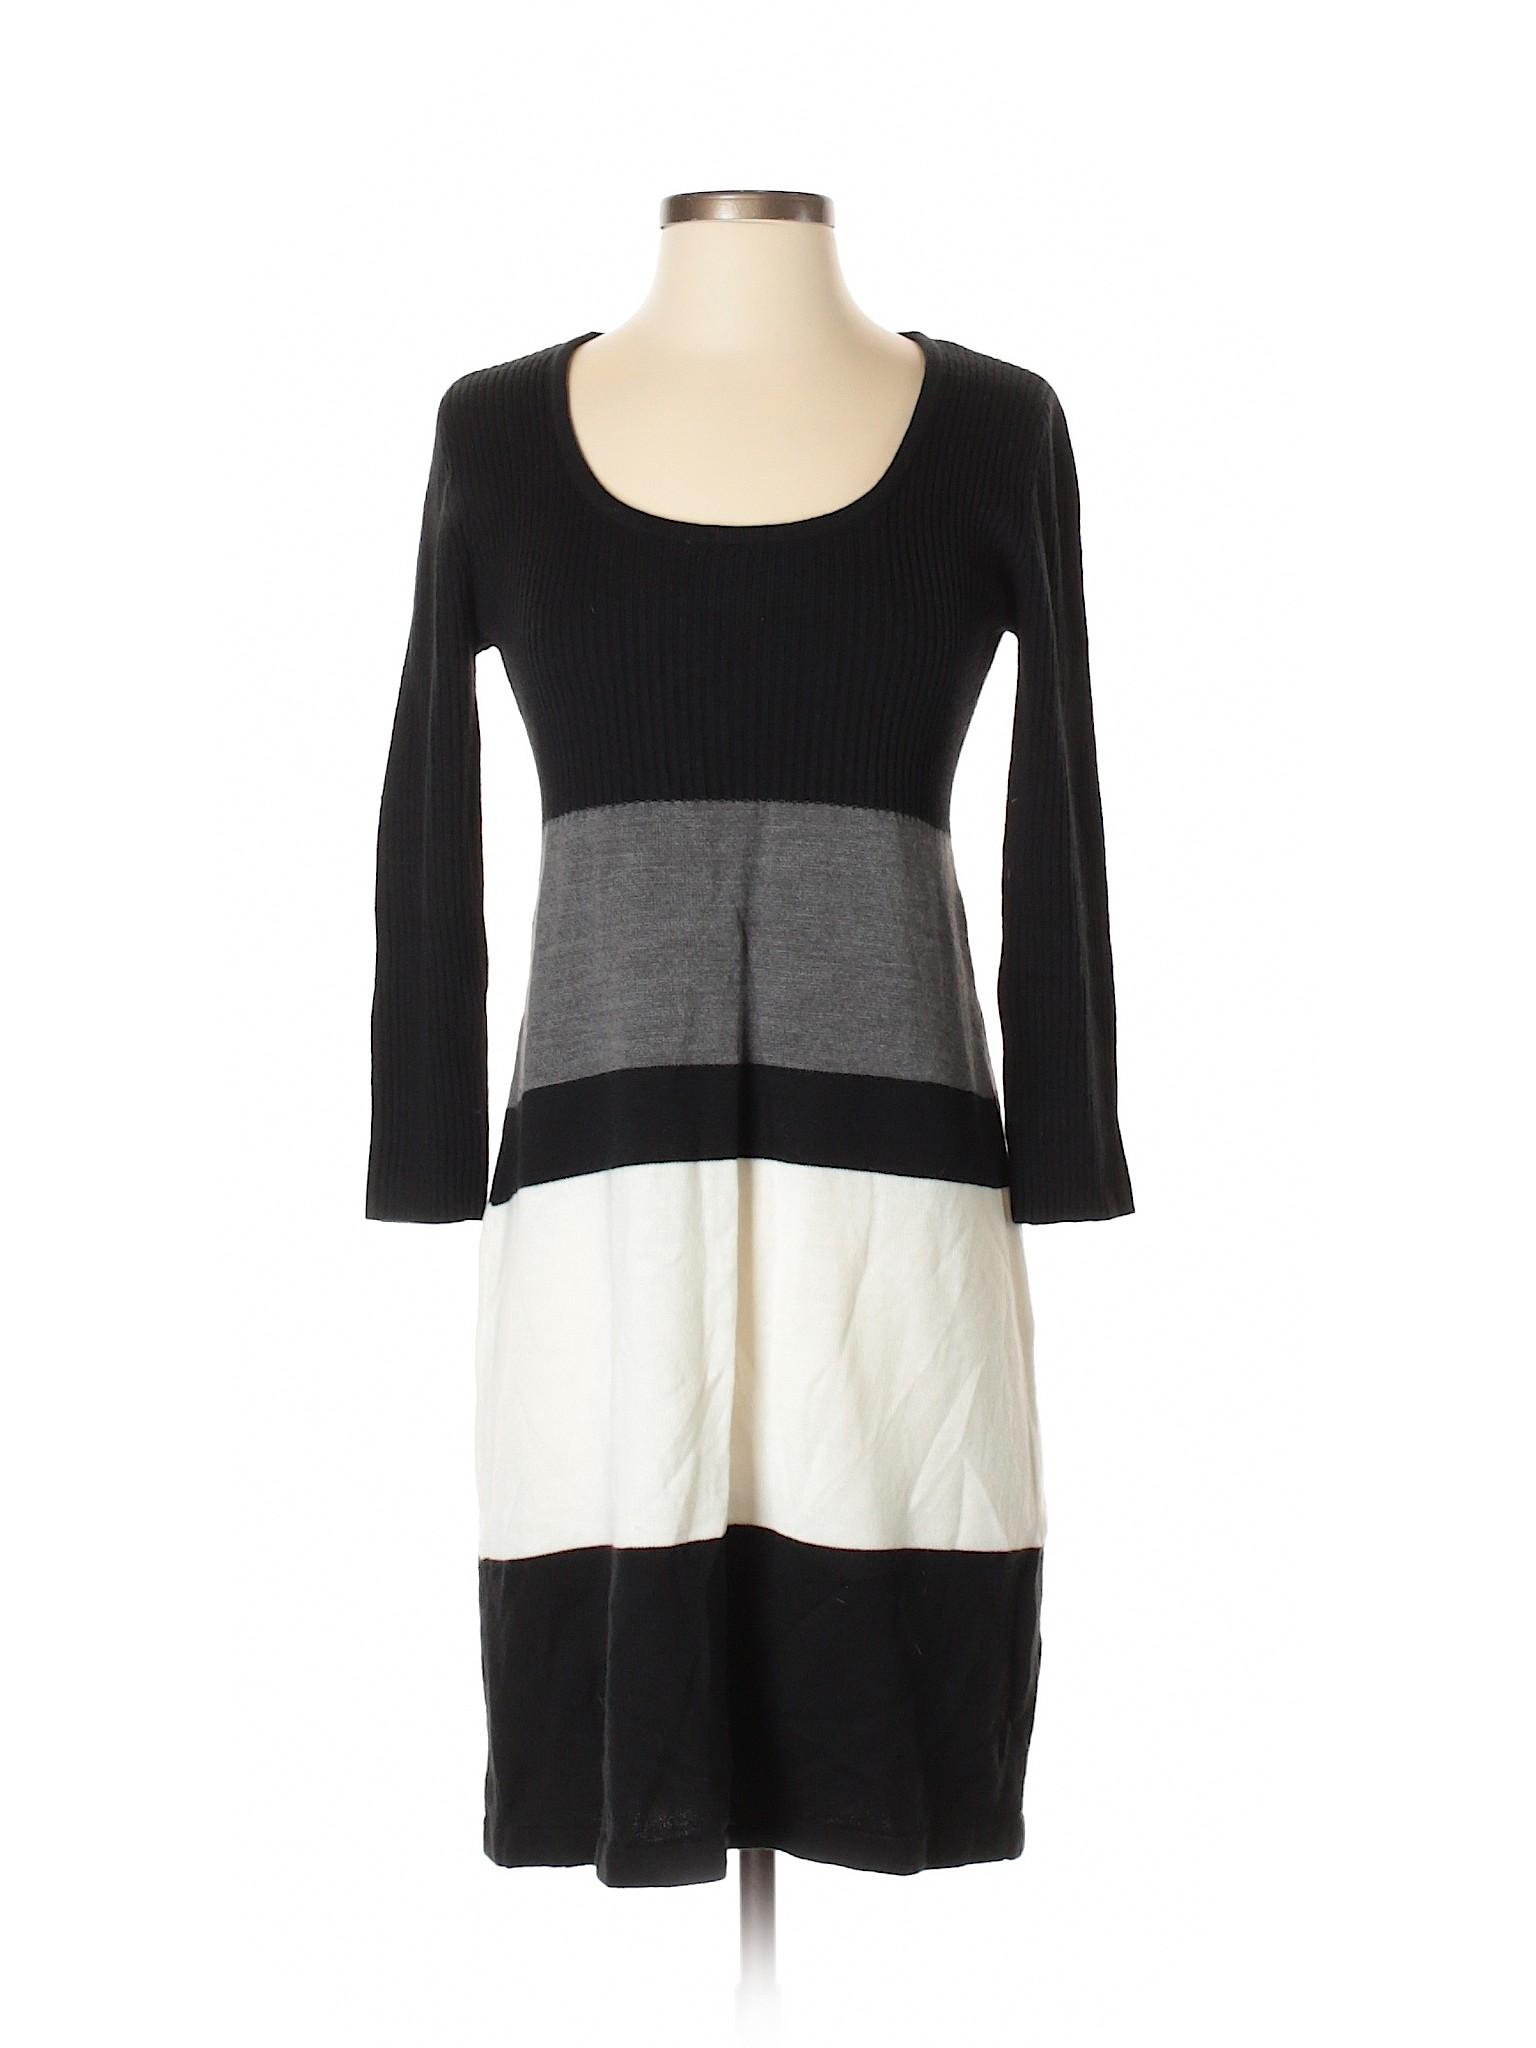 Boutique winter Dress Darren Sandra Casual BzBRw